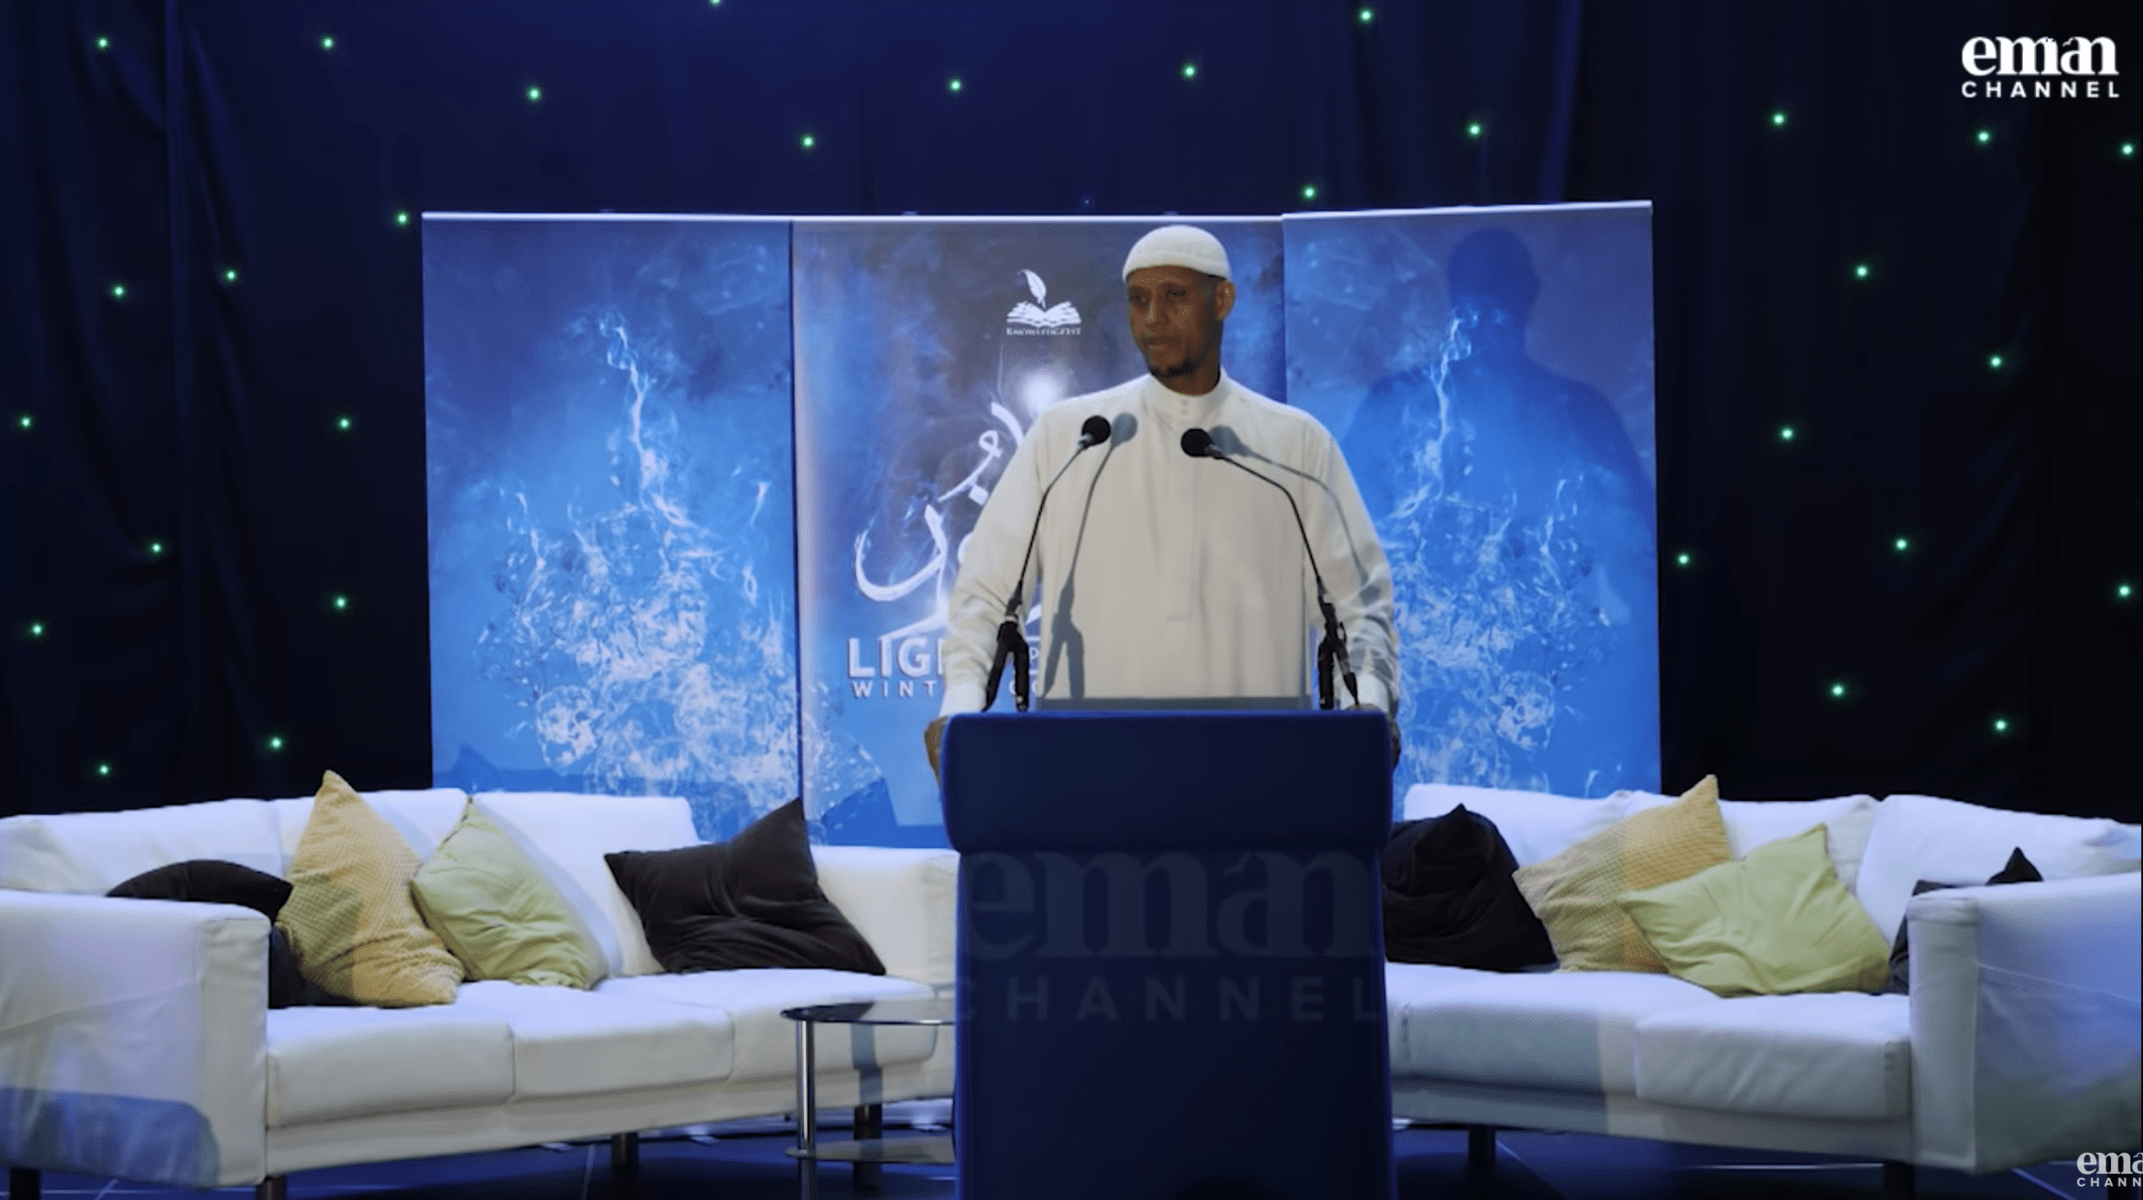 Said Rageah – Talha bin Ubaydullah